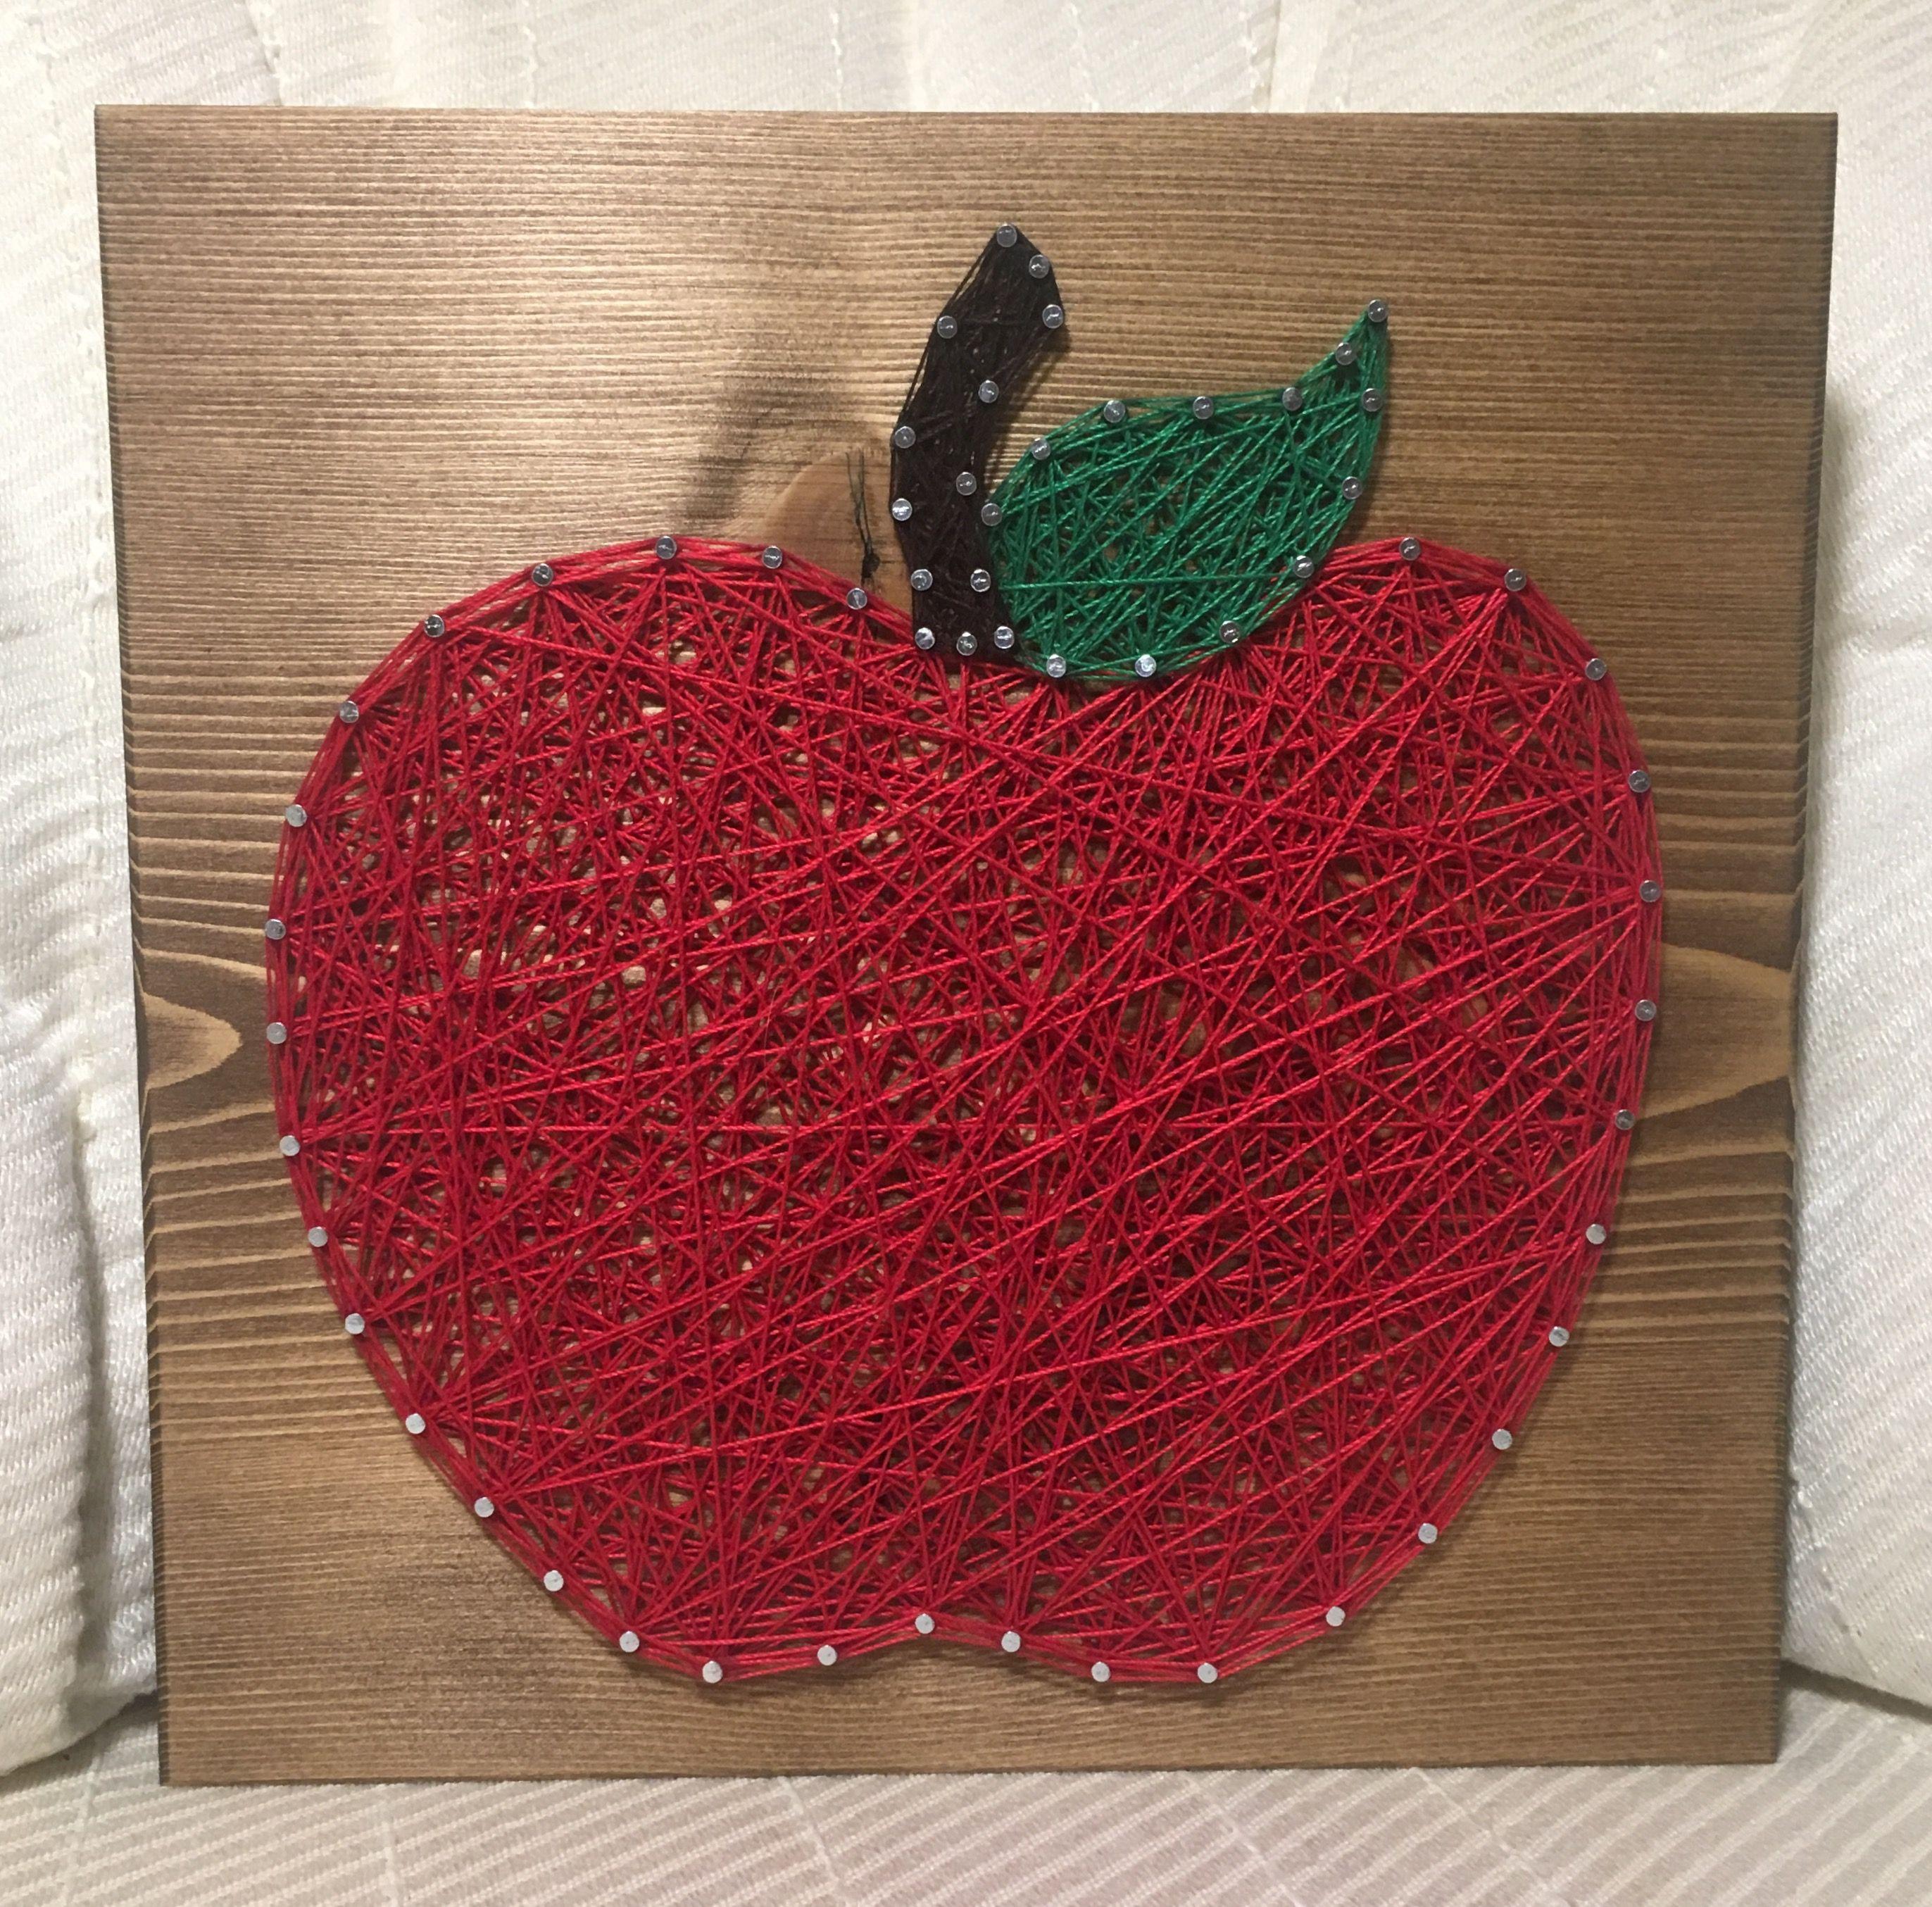 Apple Teacher String Art School Order From Kiwistrings On Etsy Wistringssy